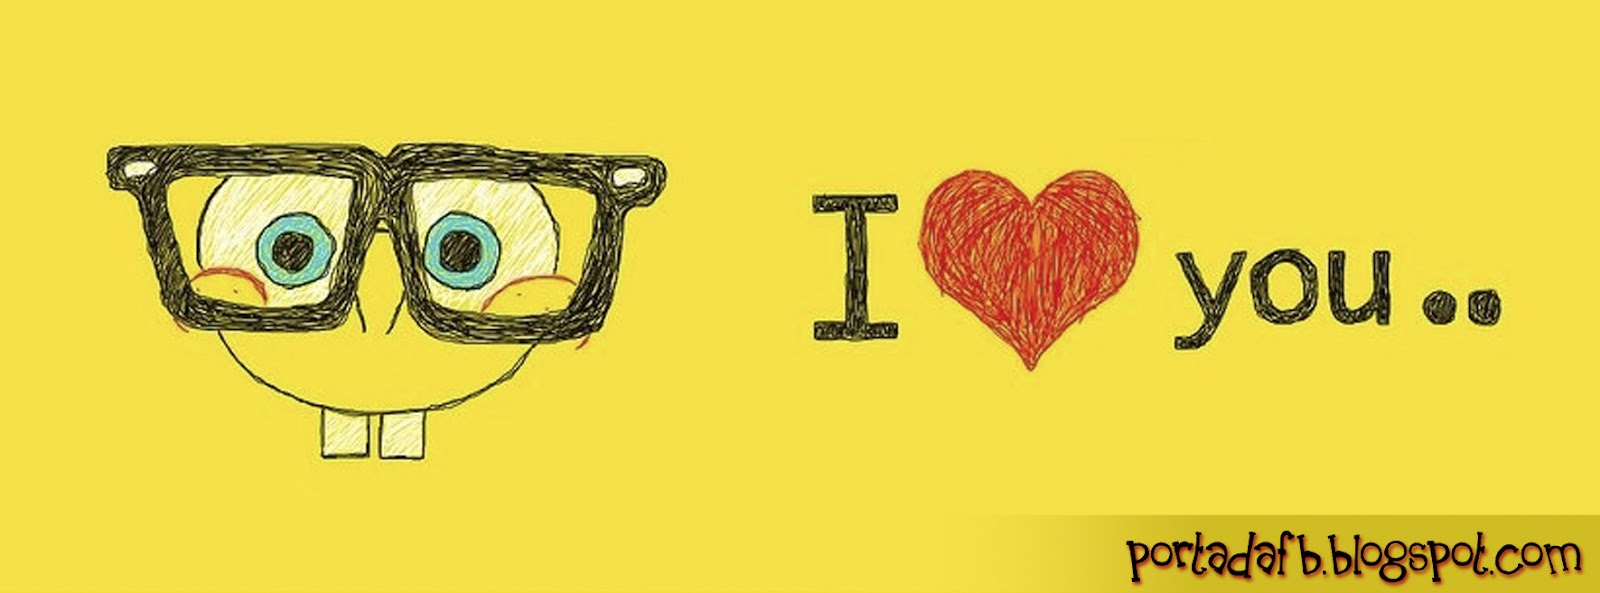 Portada Facebook - Bob Esponja - I love you